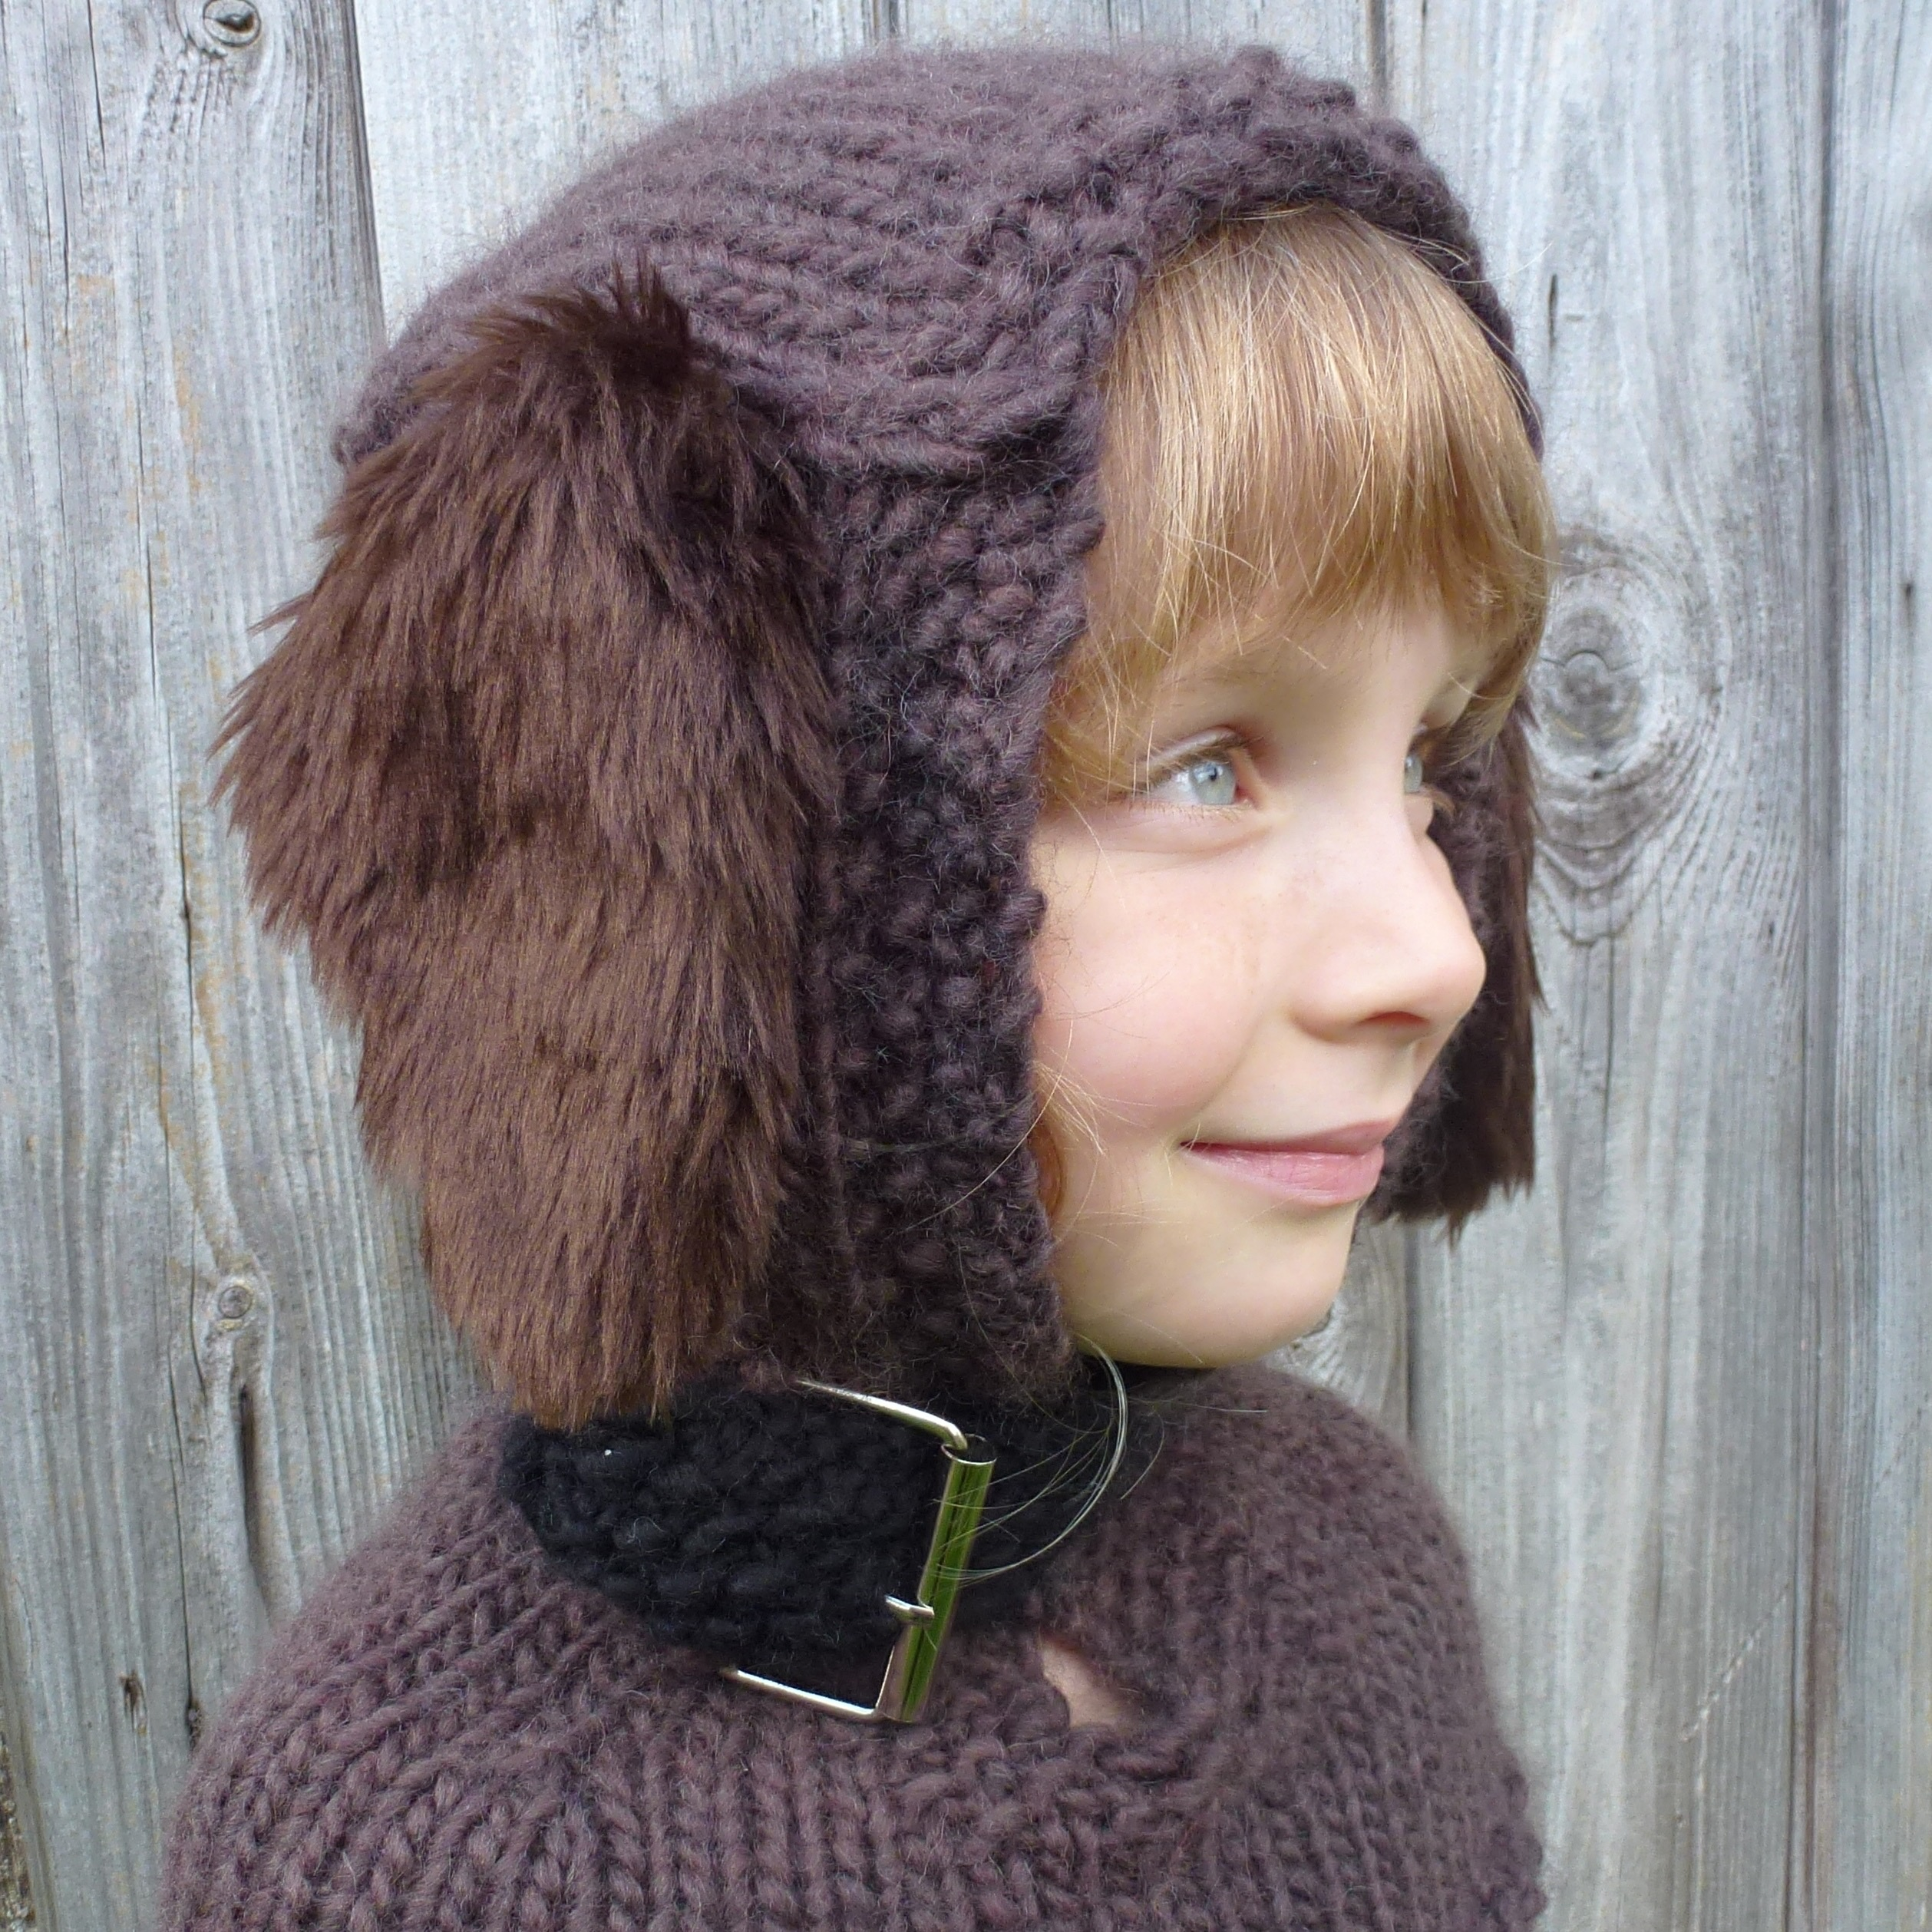 30 Dog knit 1